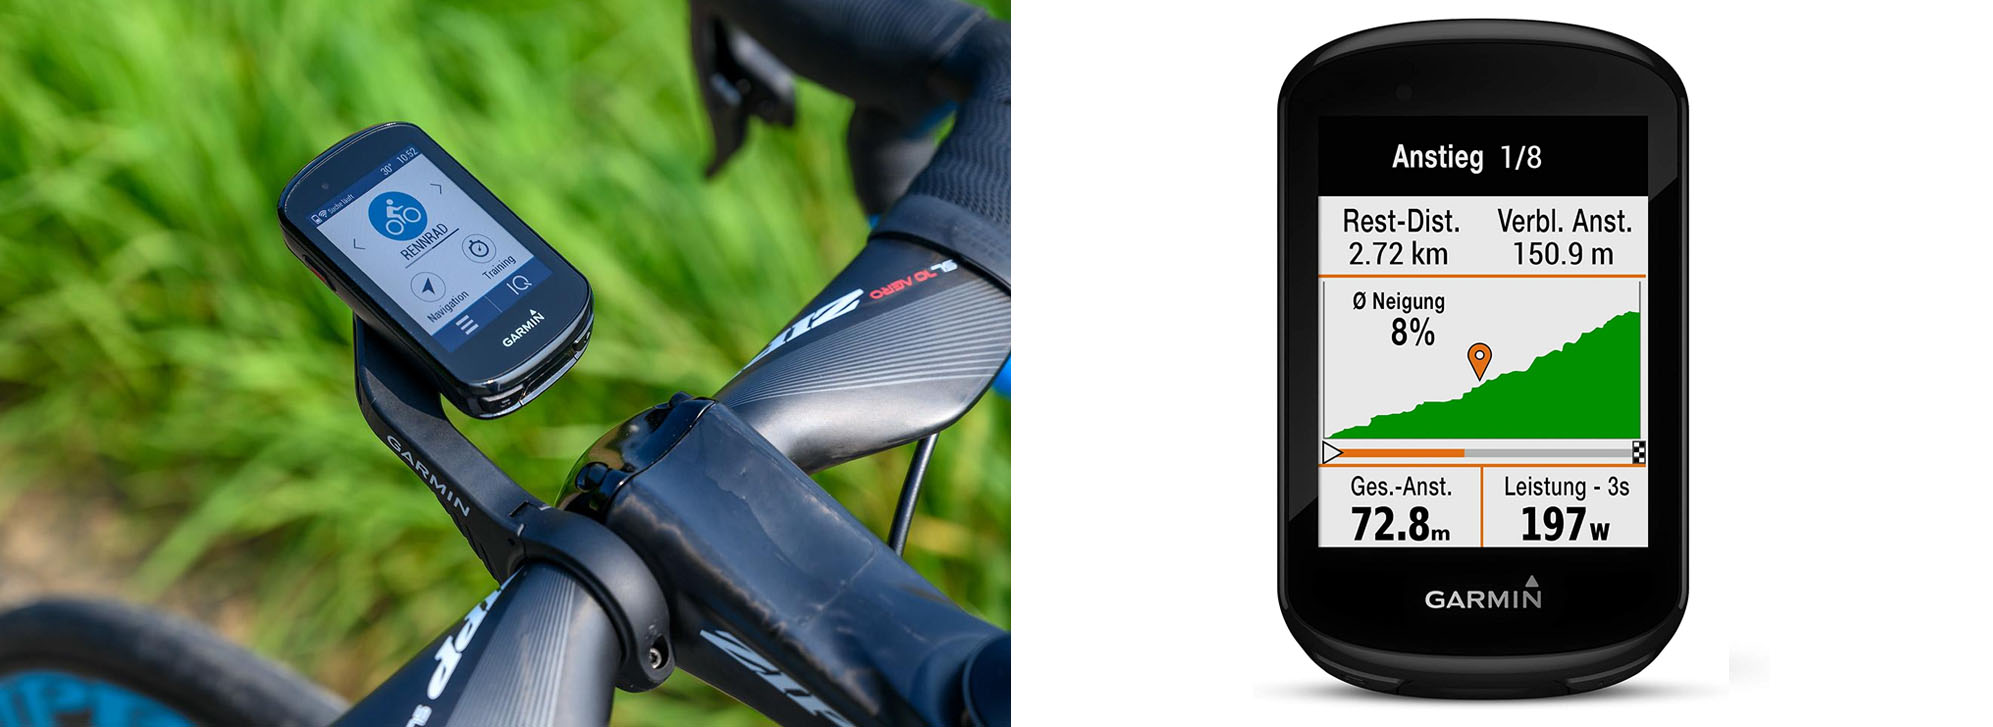 ciclomputador gps ciclismo garmin edge 830 bundle 2021